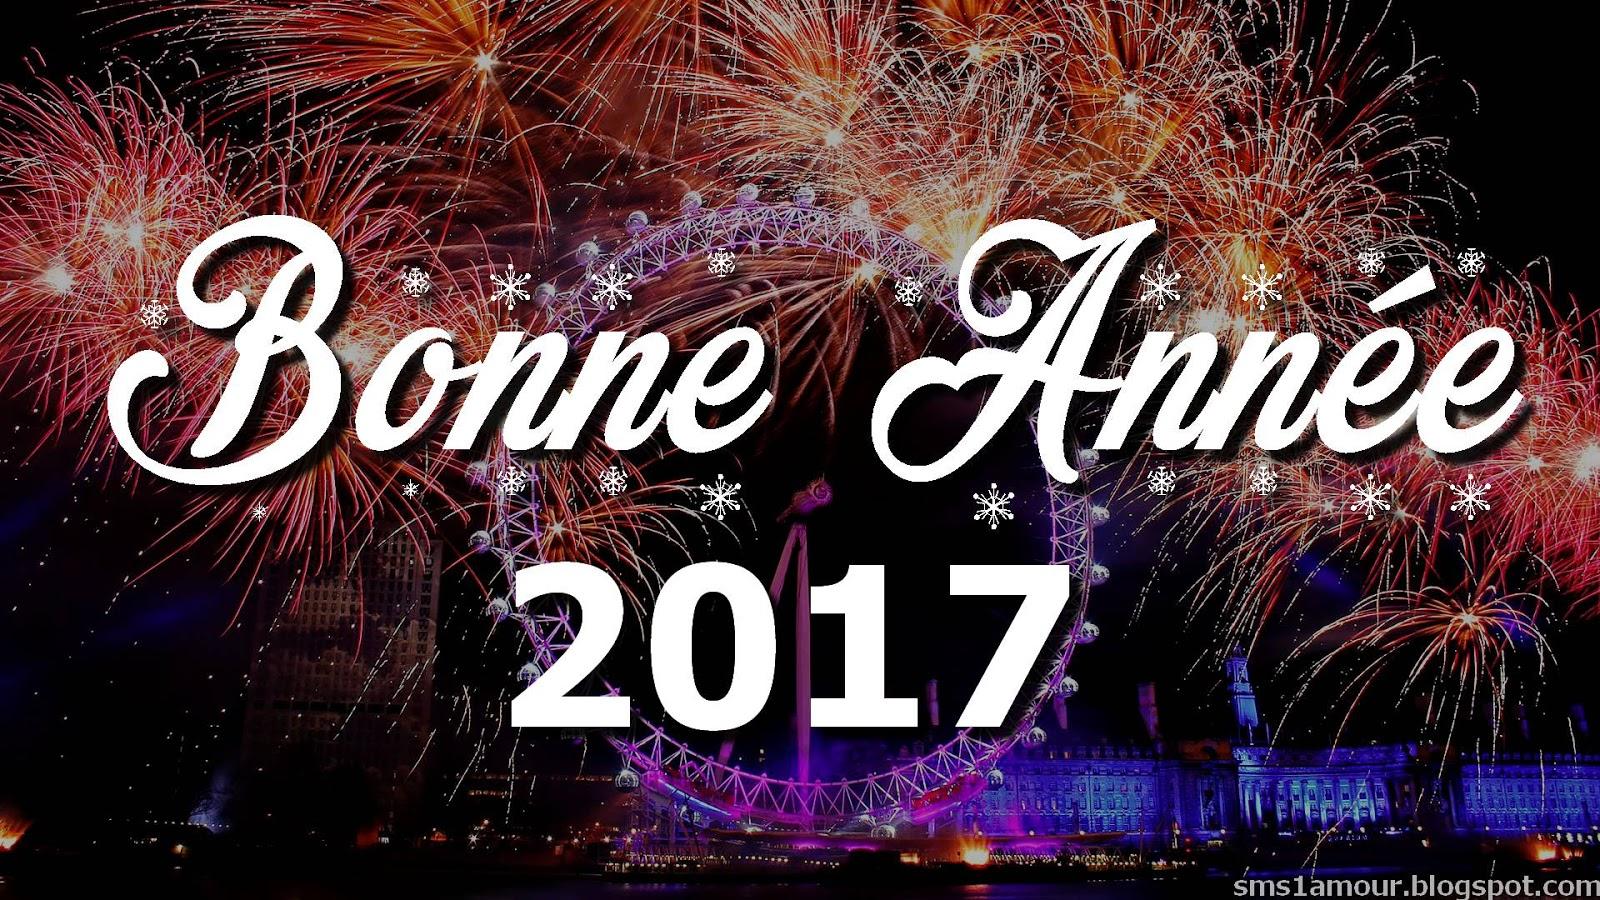 message bonne annee 2017